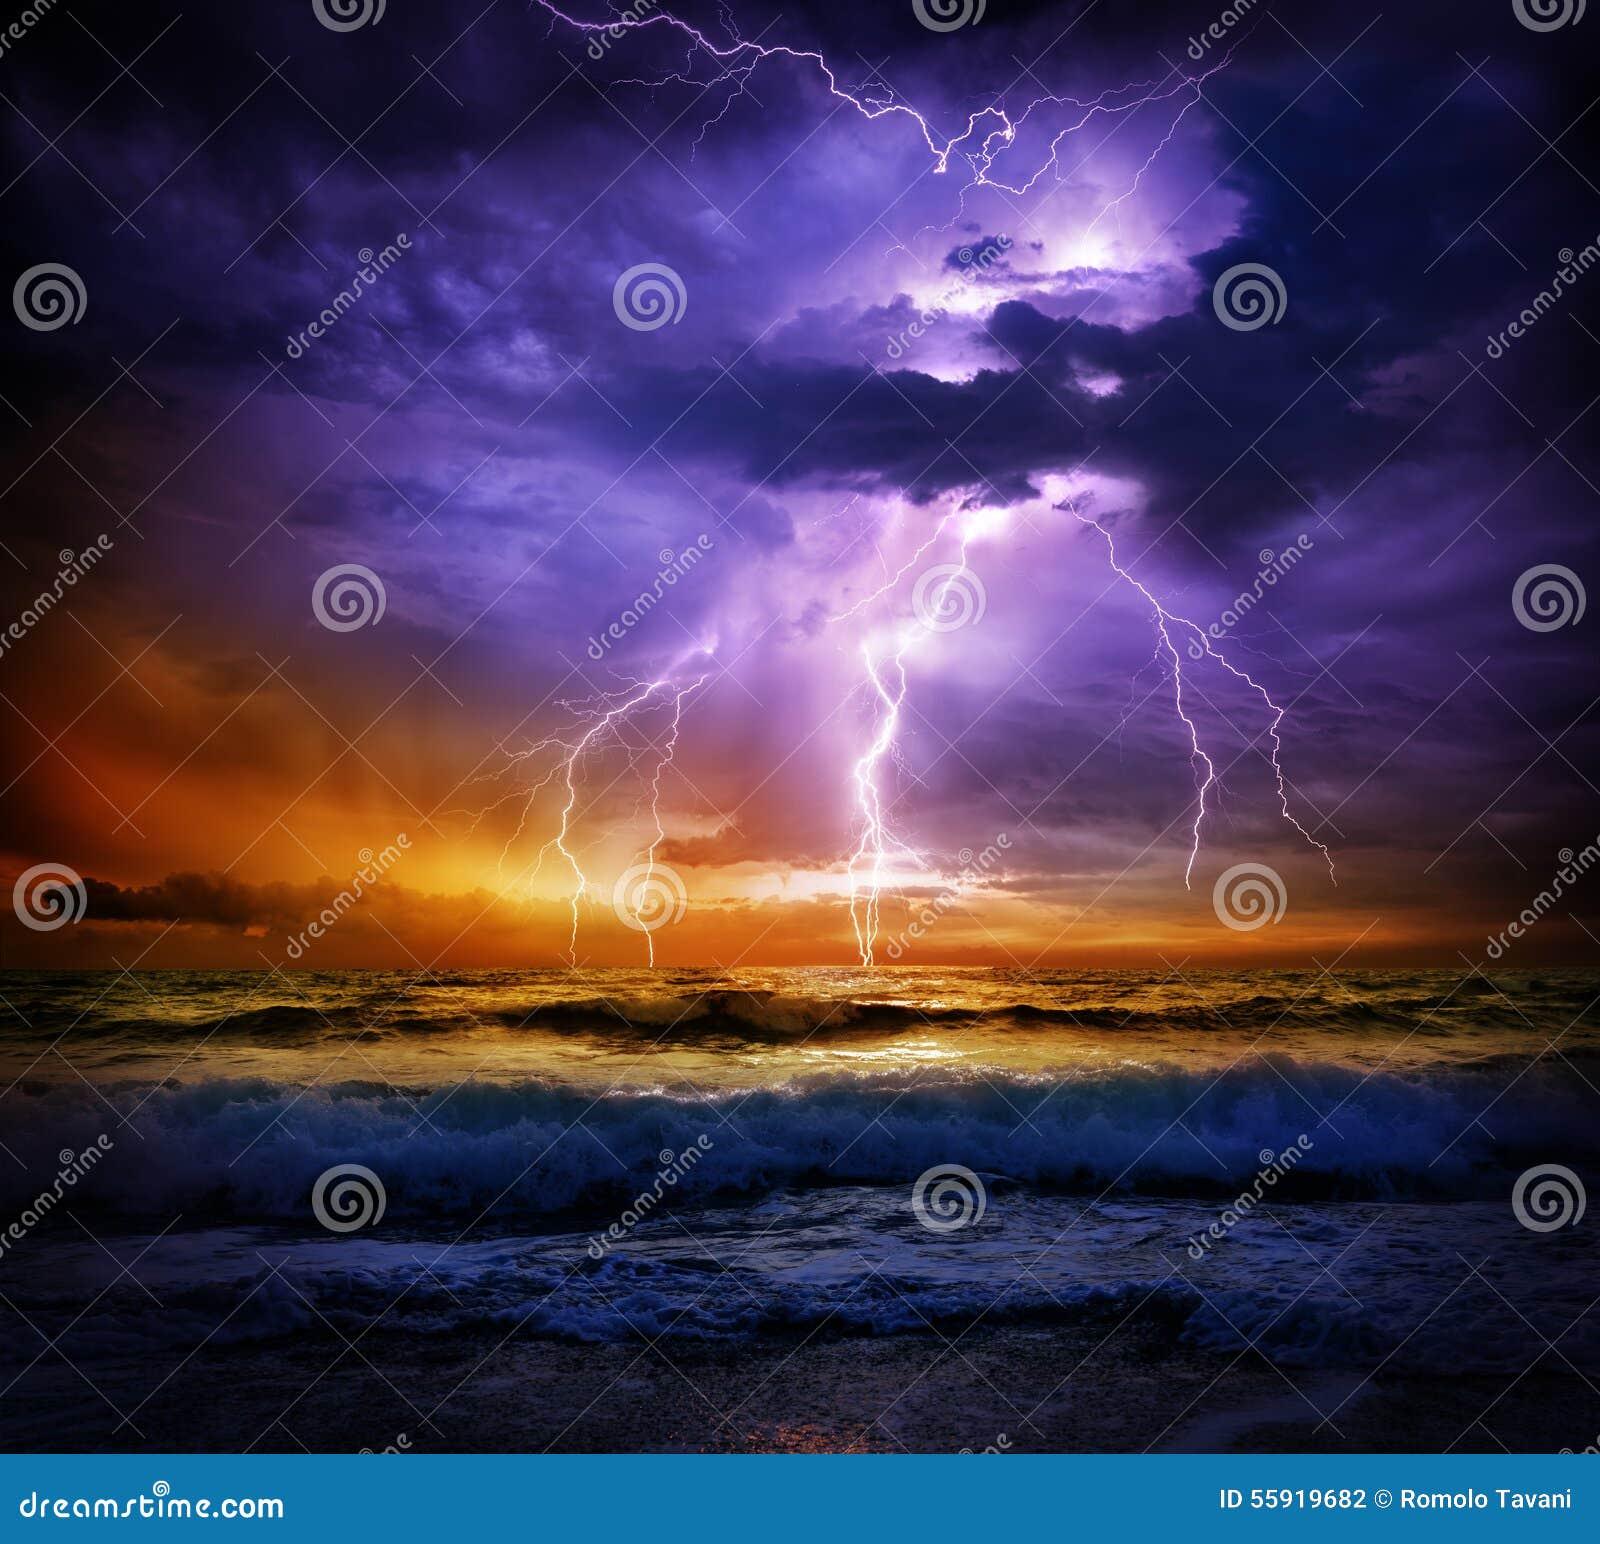 Bliksem en onweer op overzees aan de zonsondergang